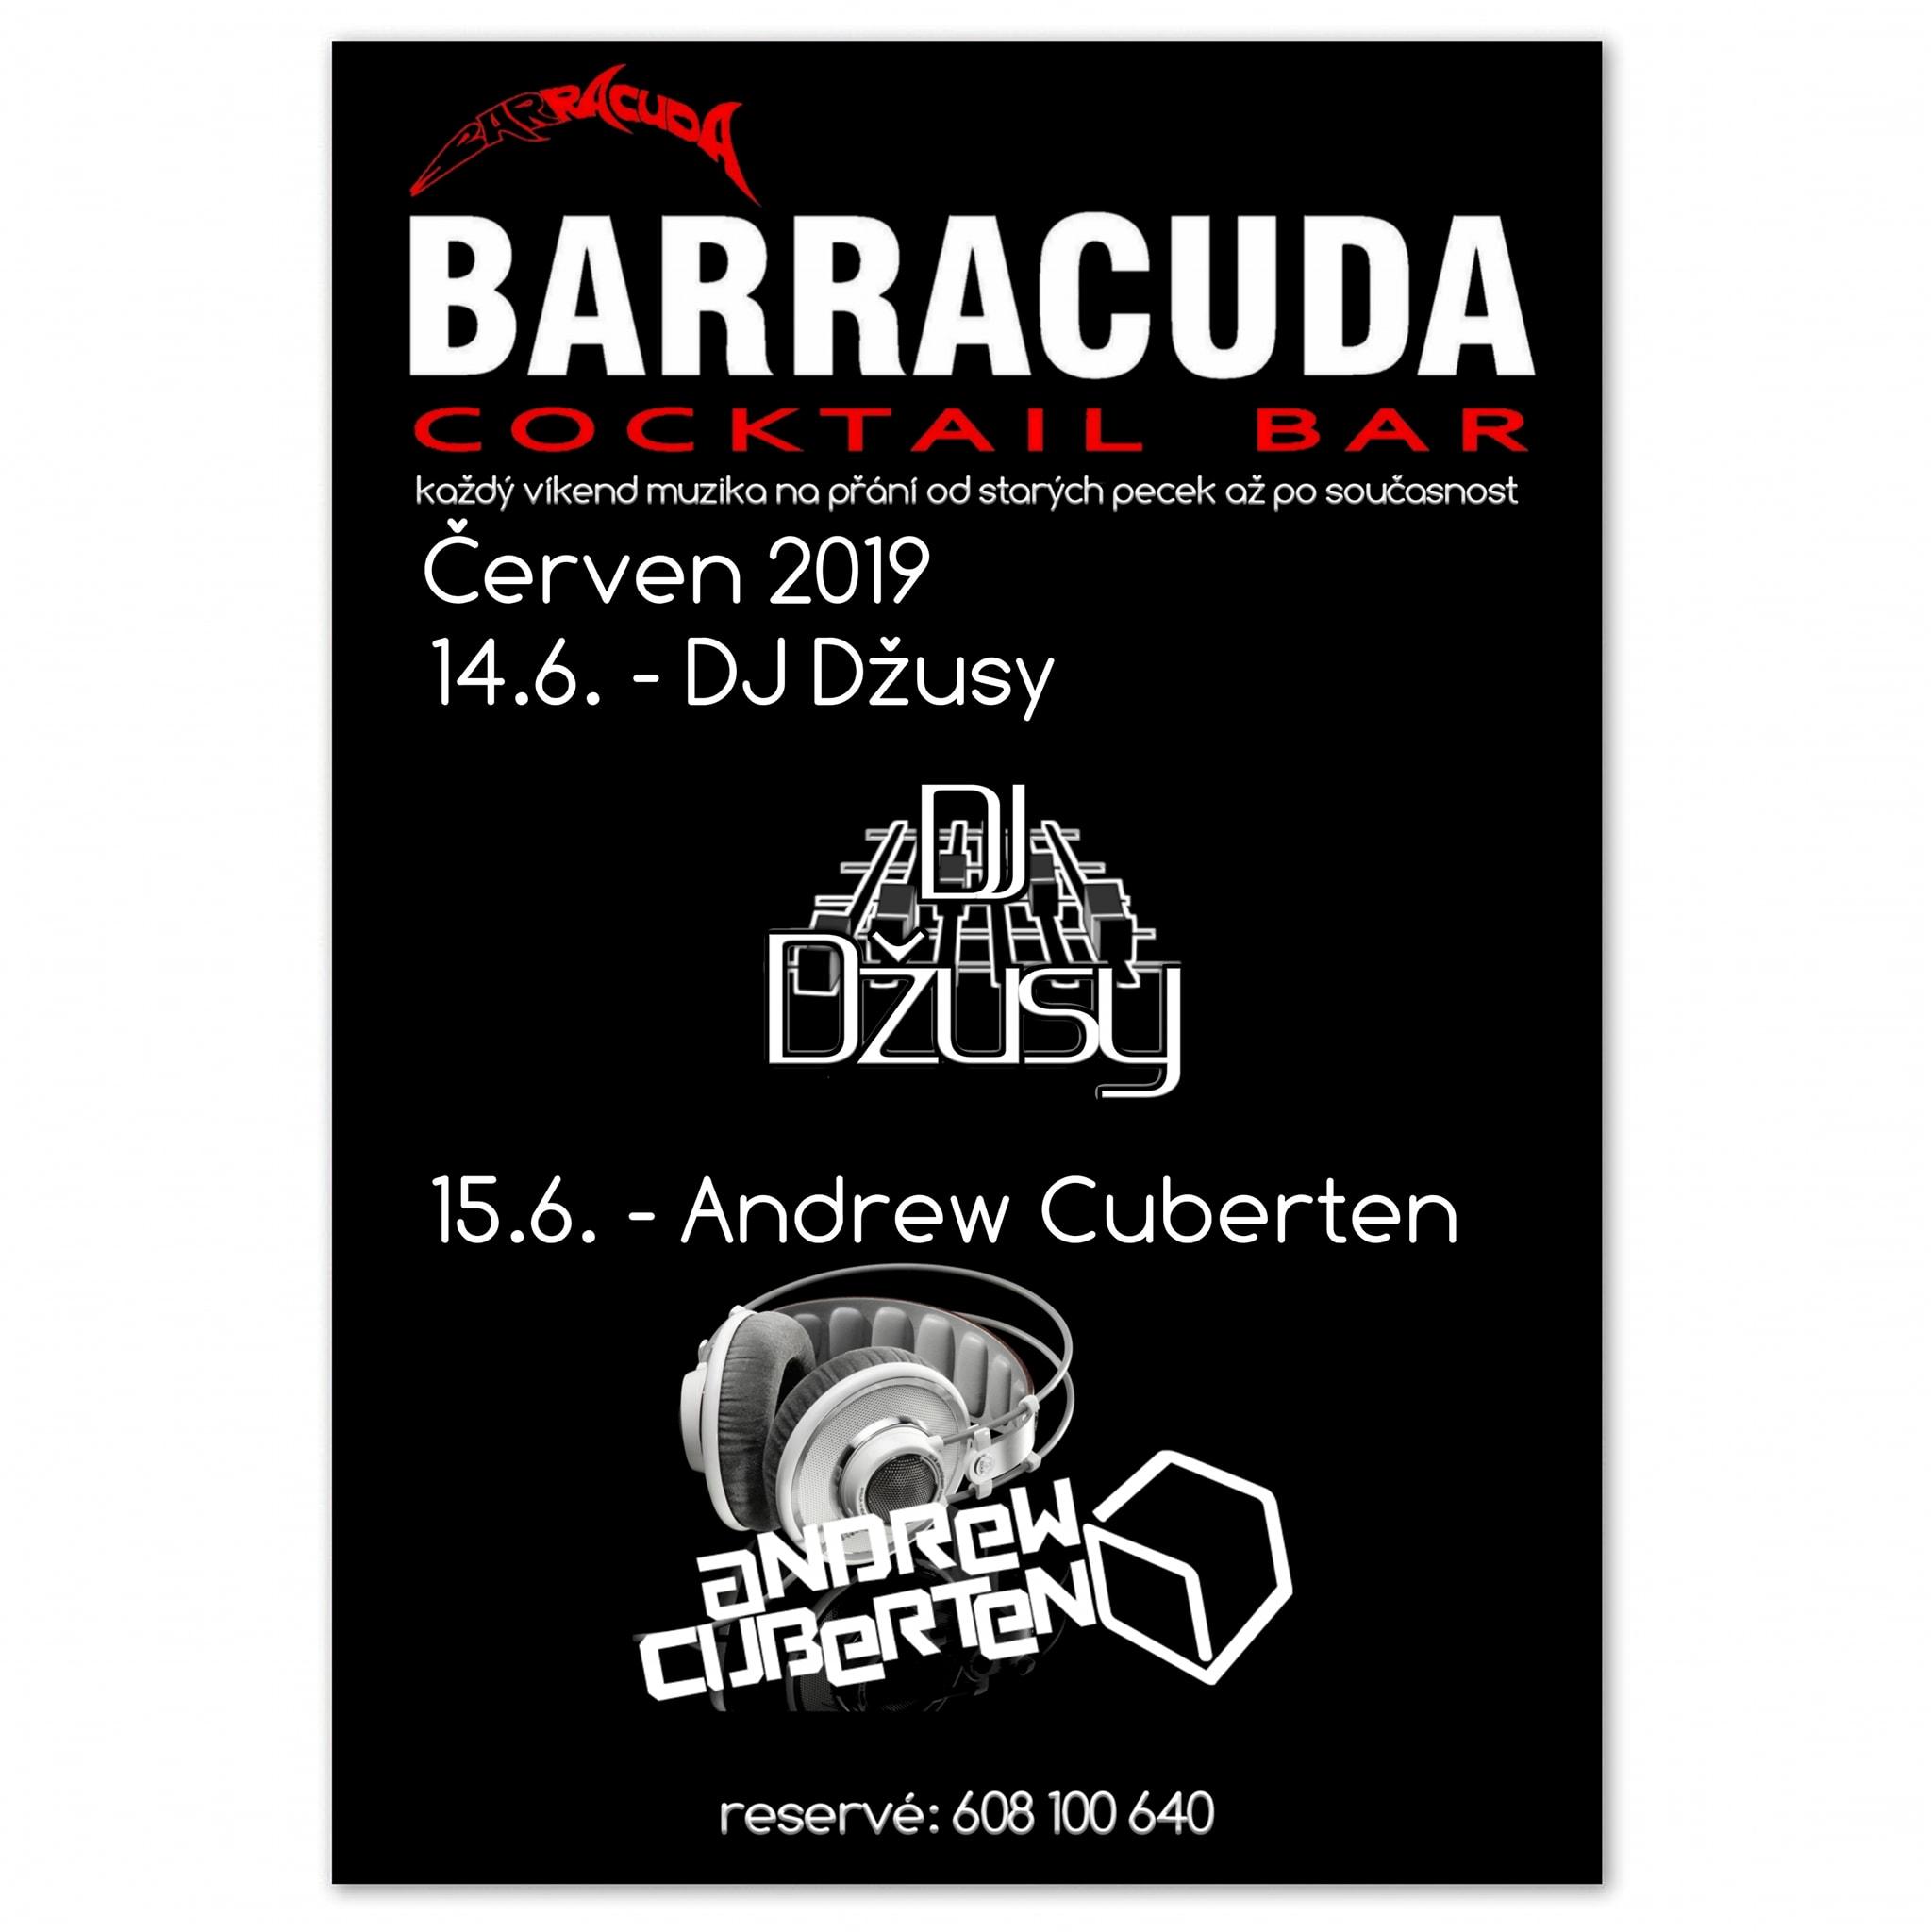 Barracuda Coctail Bar